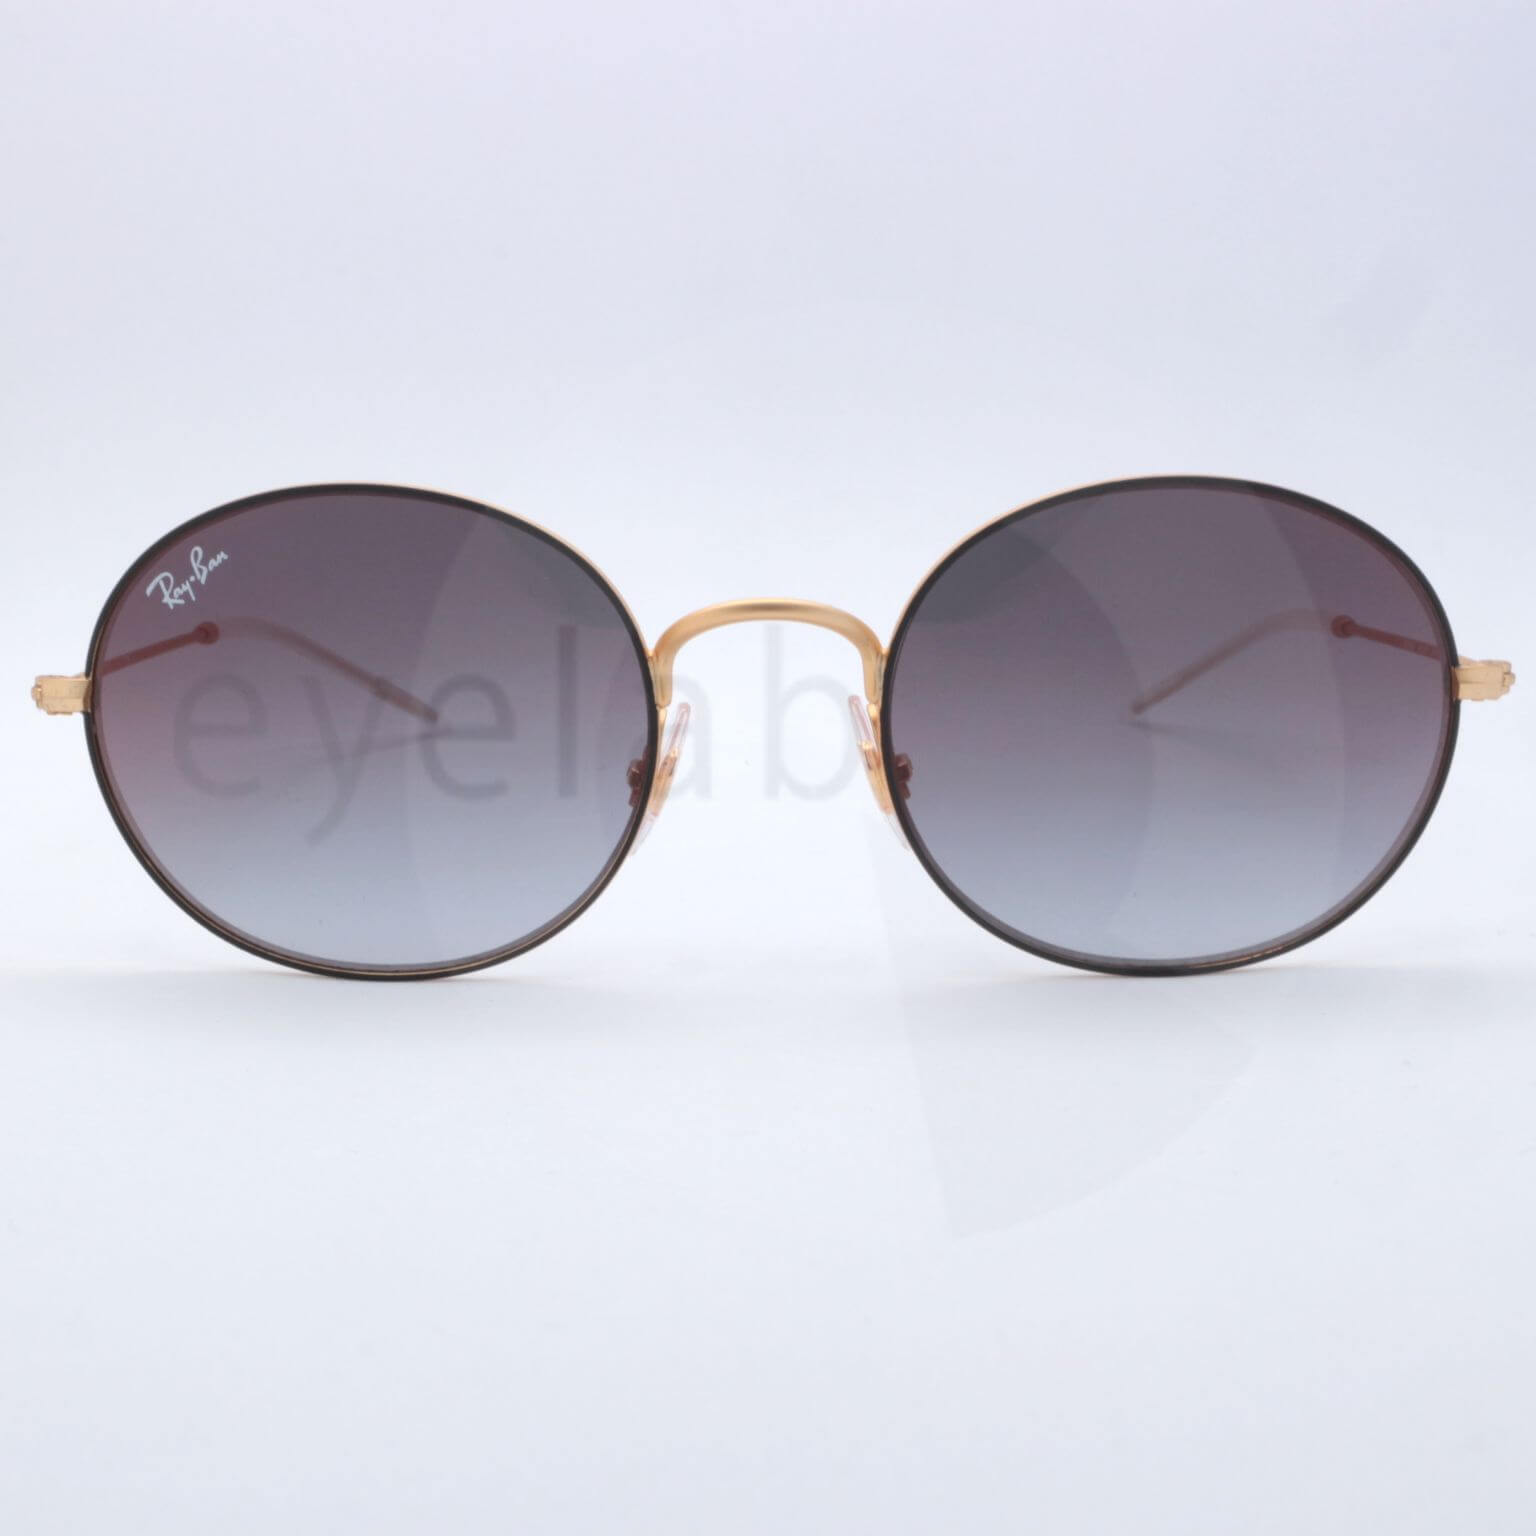 60d9b04c08 Γυαλιά ηλίου Ray-Ban 3594 9114U0 ~ Eyelab